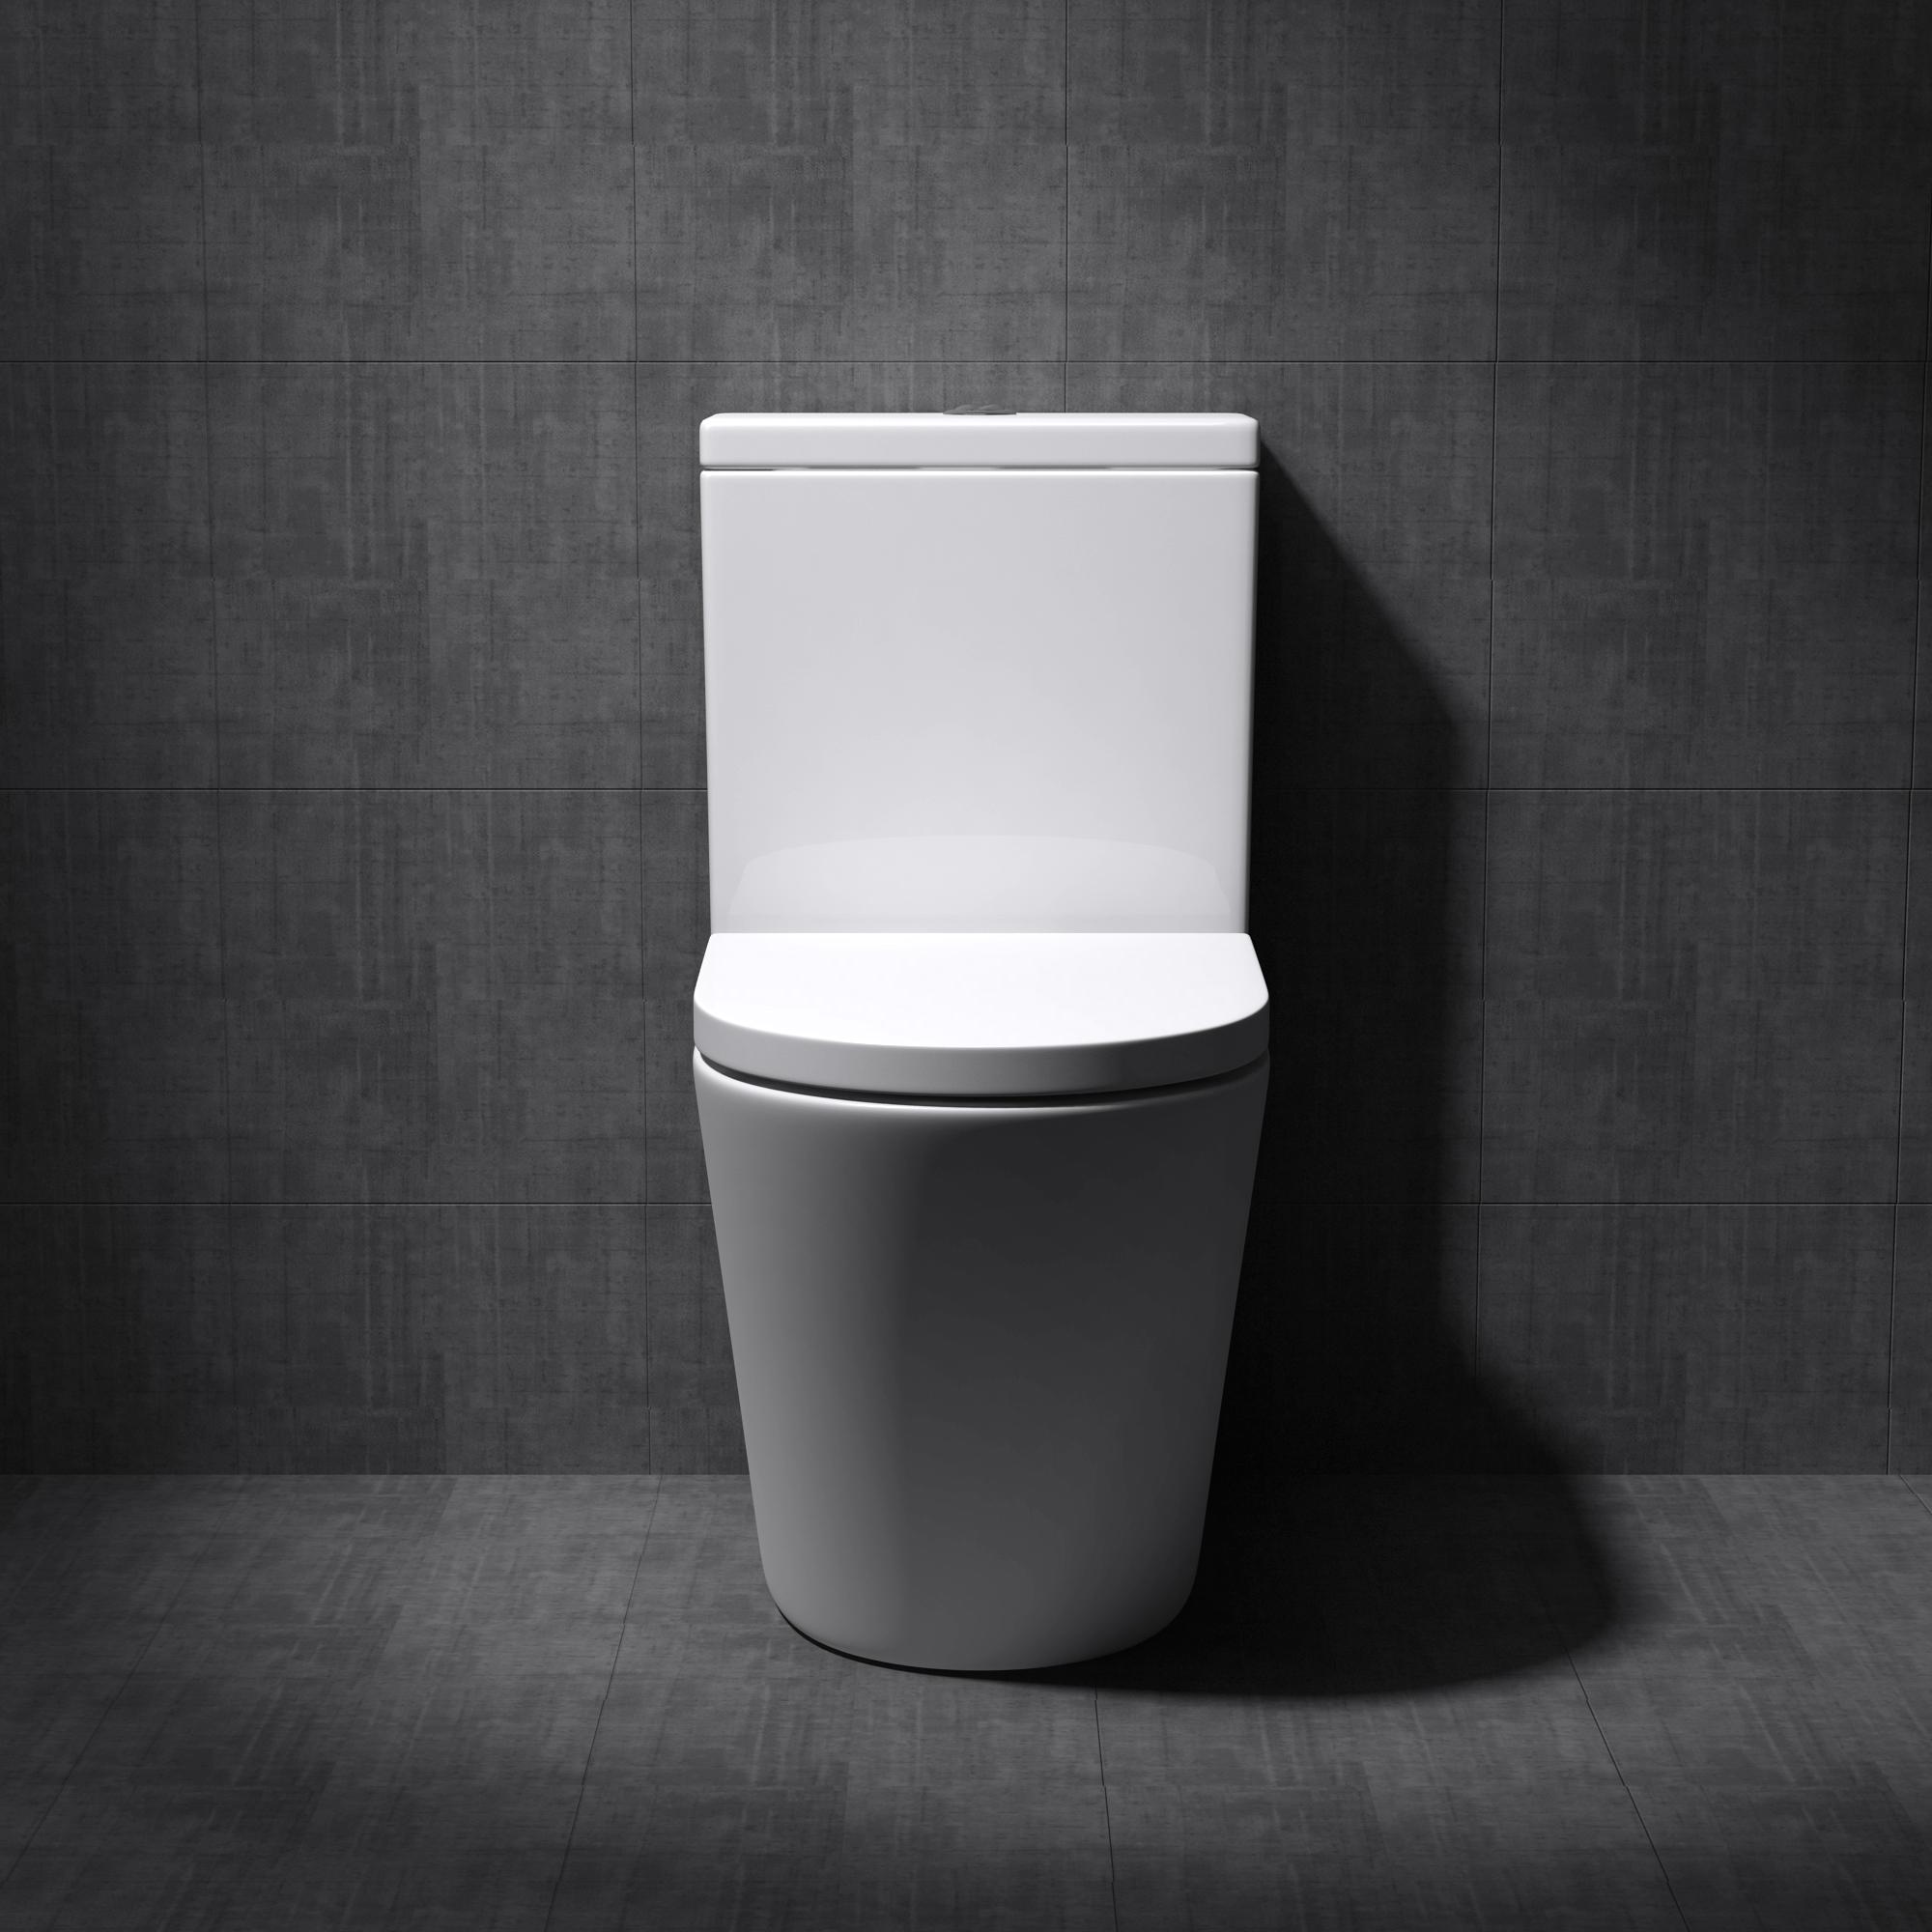 sp lrandloses wc mit sp lkasten stand toilette softclose wc sitz abnehmbar neu ebay. Black Bedroom Furniture Sets. Home Design Ideas